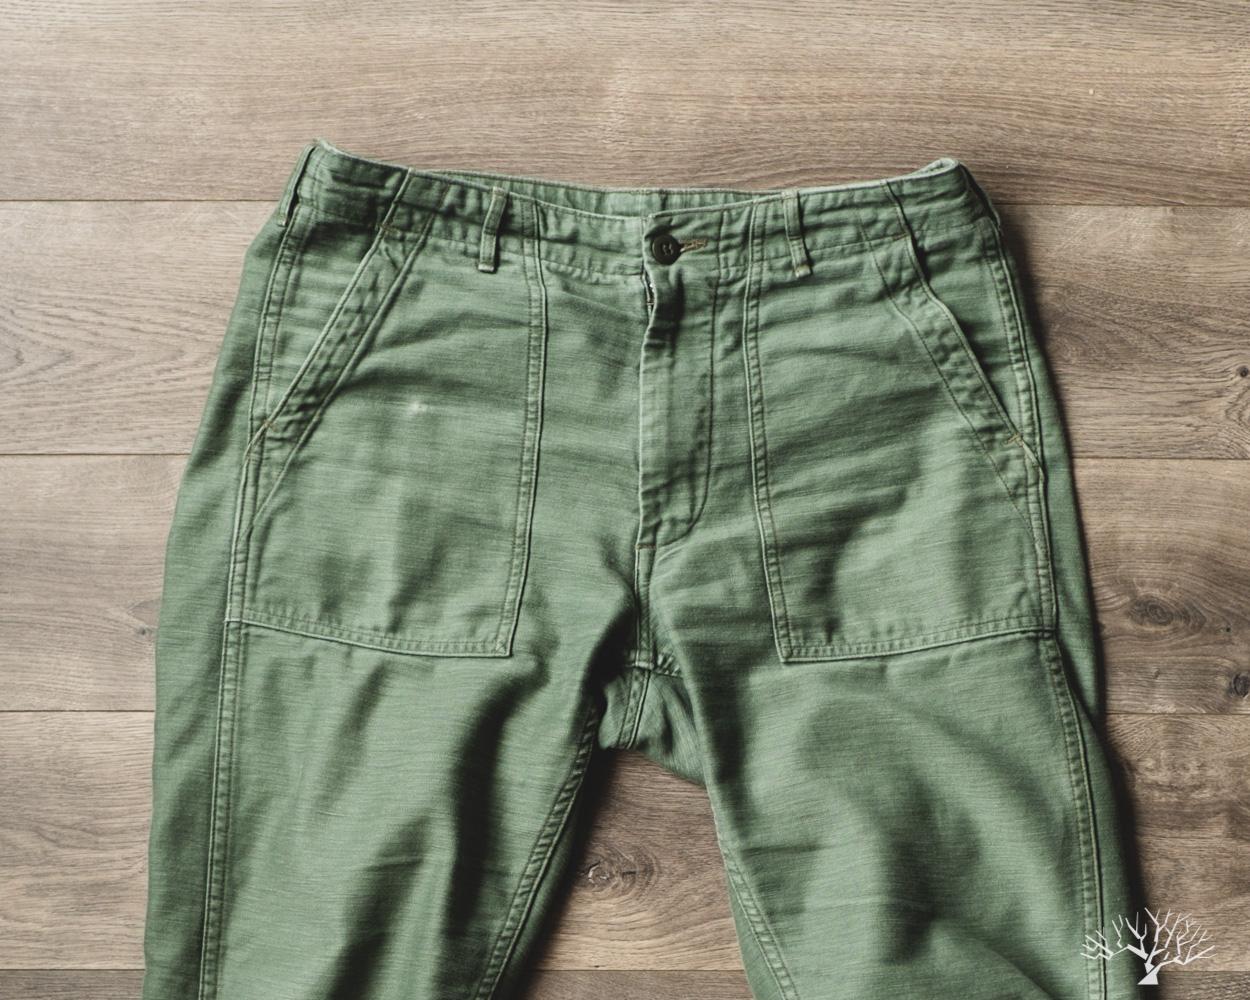 orSlow Slim Fit Fatigue Pants Olive Reverse Sateen